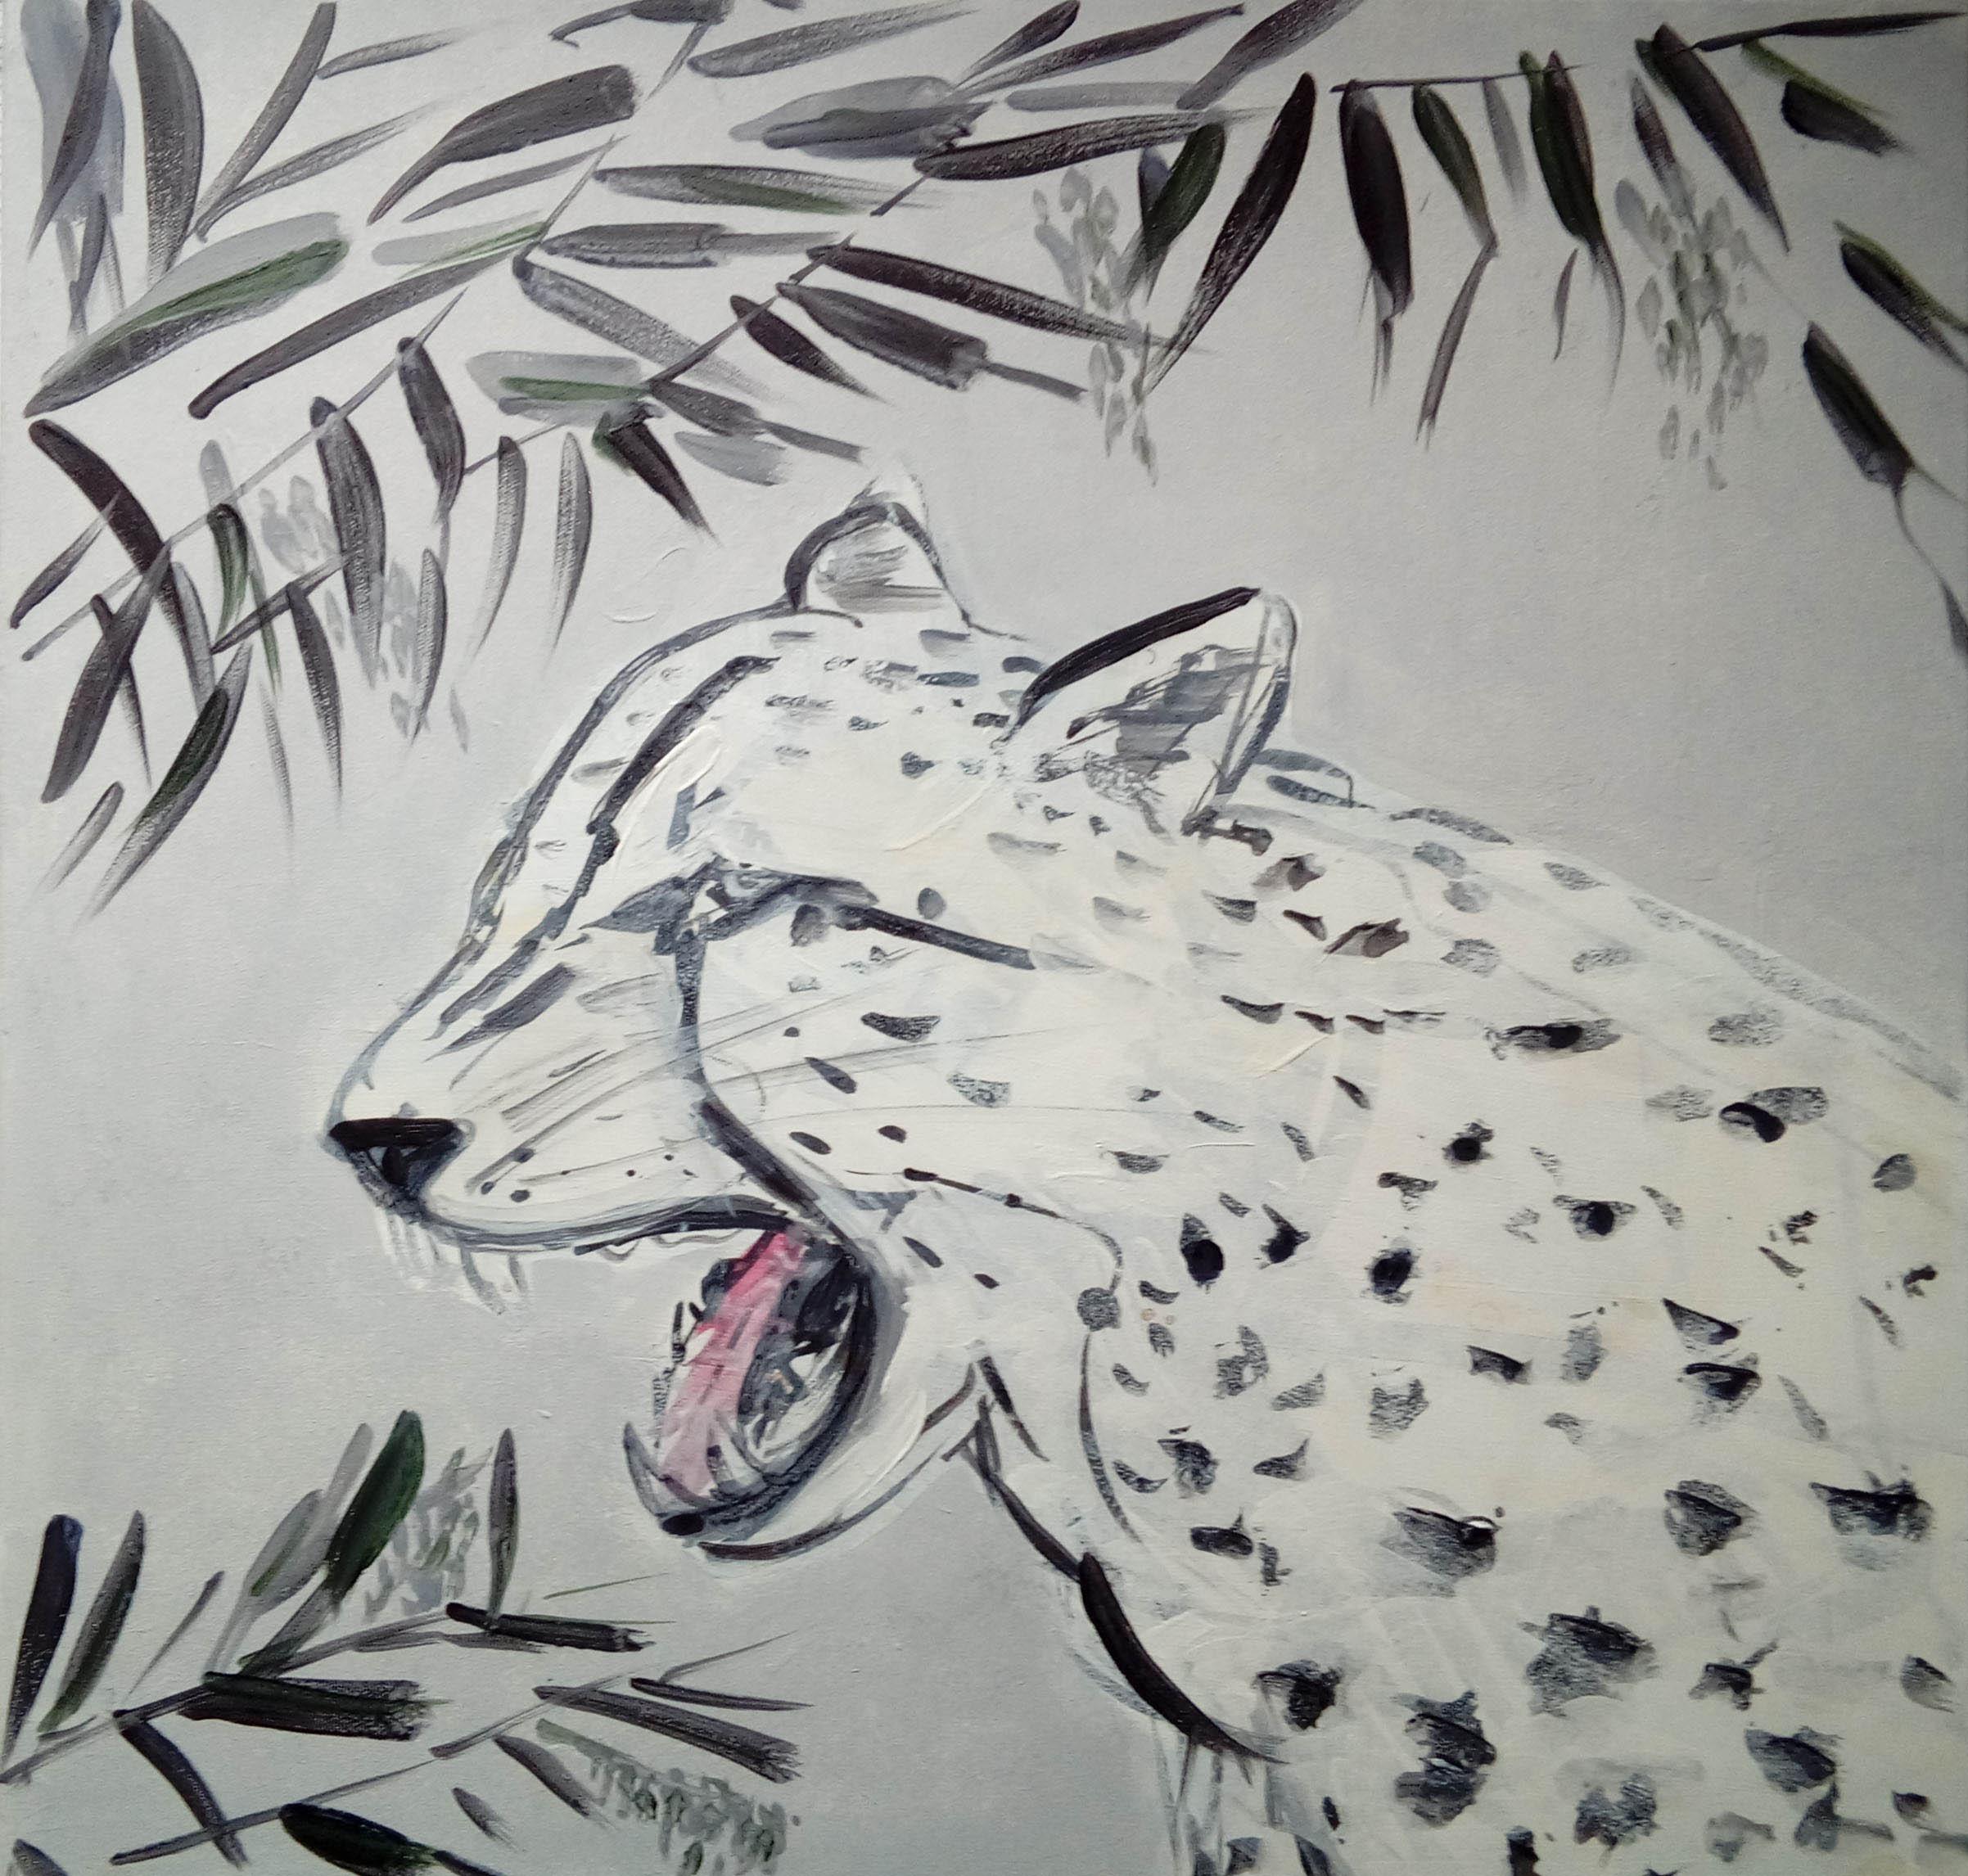 Gepardzica, 2020